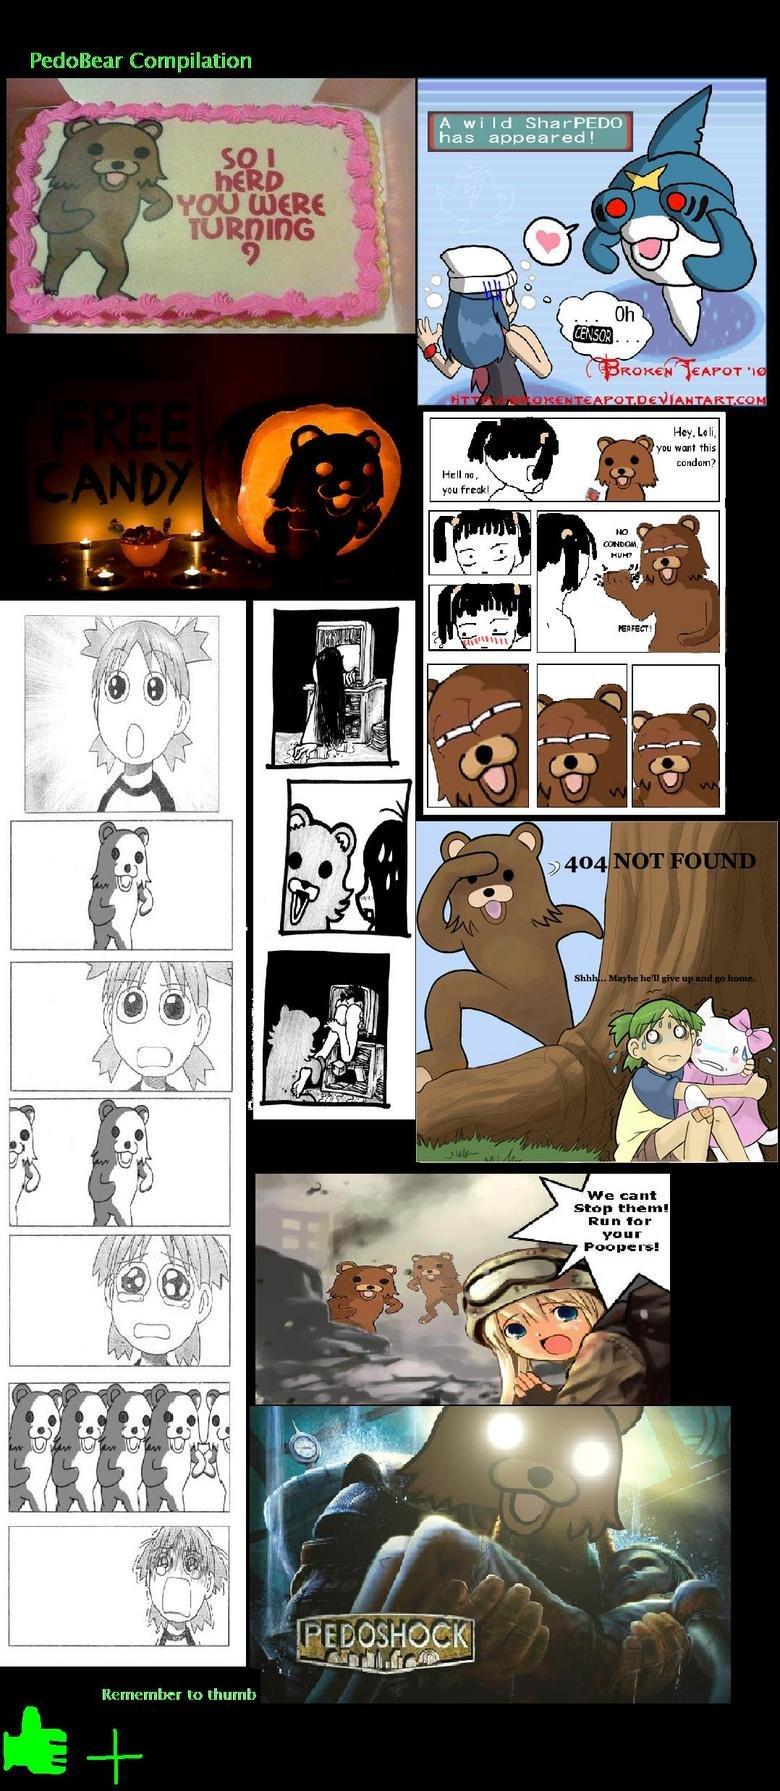 Pedobear Comp. Dont forget to THUMB +. Wu wan! nus stop them! Ru n lor your to trauma, pedobear